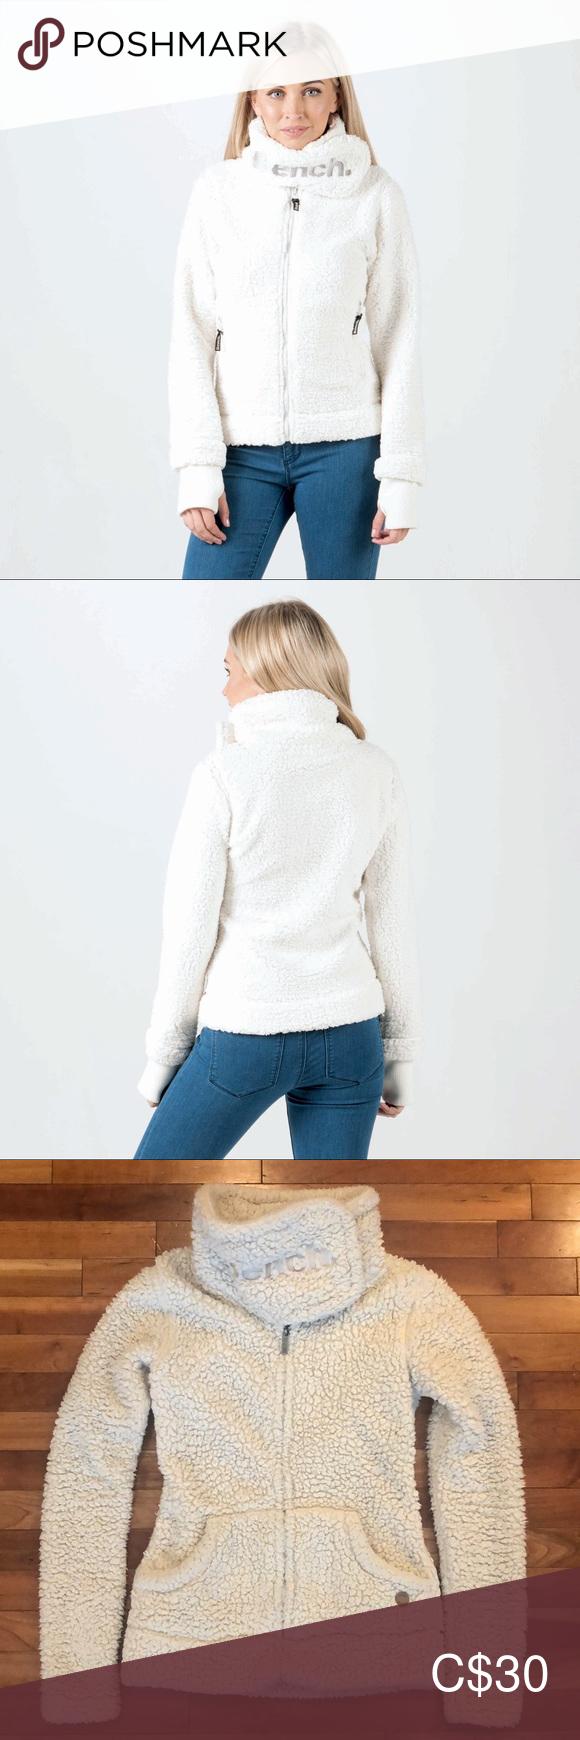 2 For 20 Bench Sherpa Fleece Jacket Fleece Jacket Clothes Design Fashion [ 1740 x 580 Pixel ]